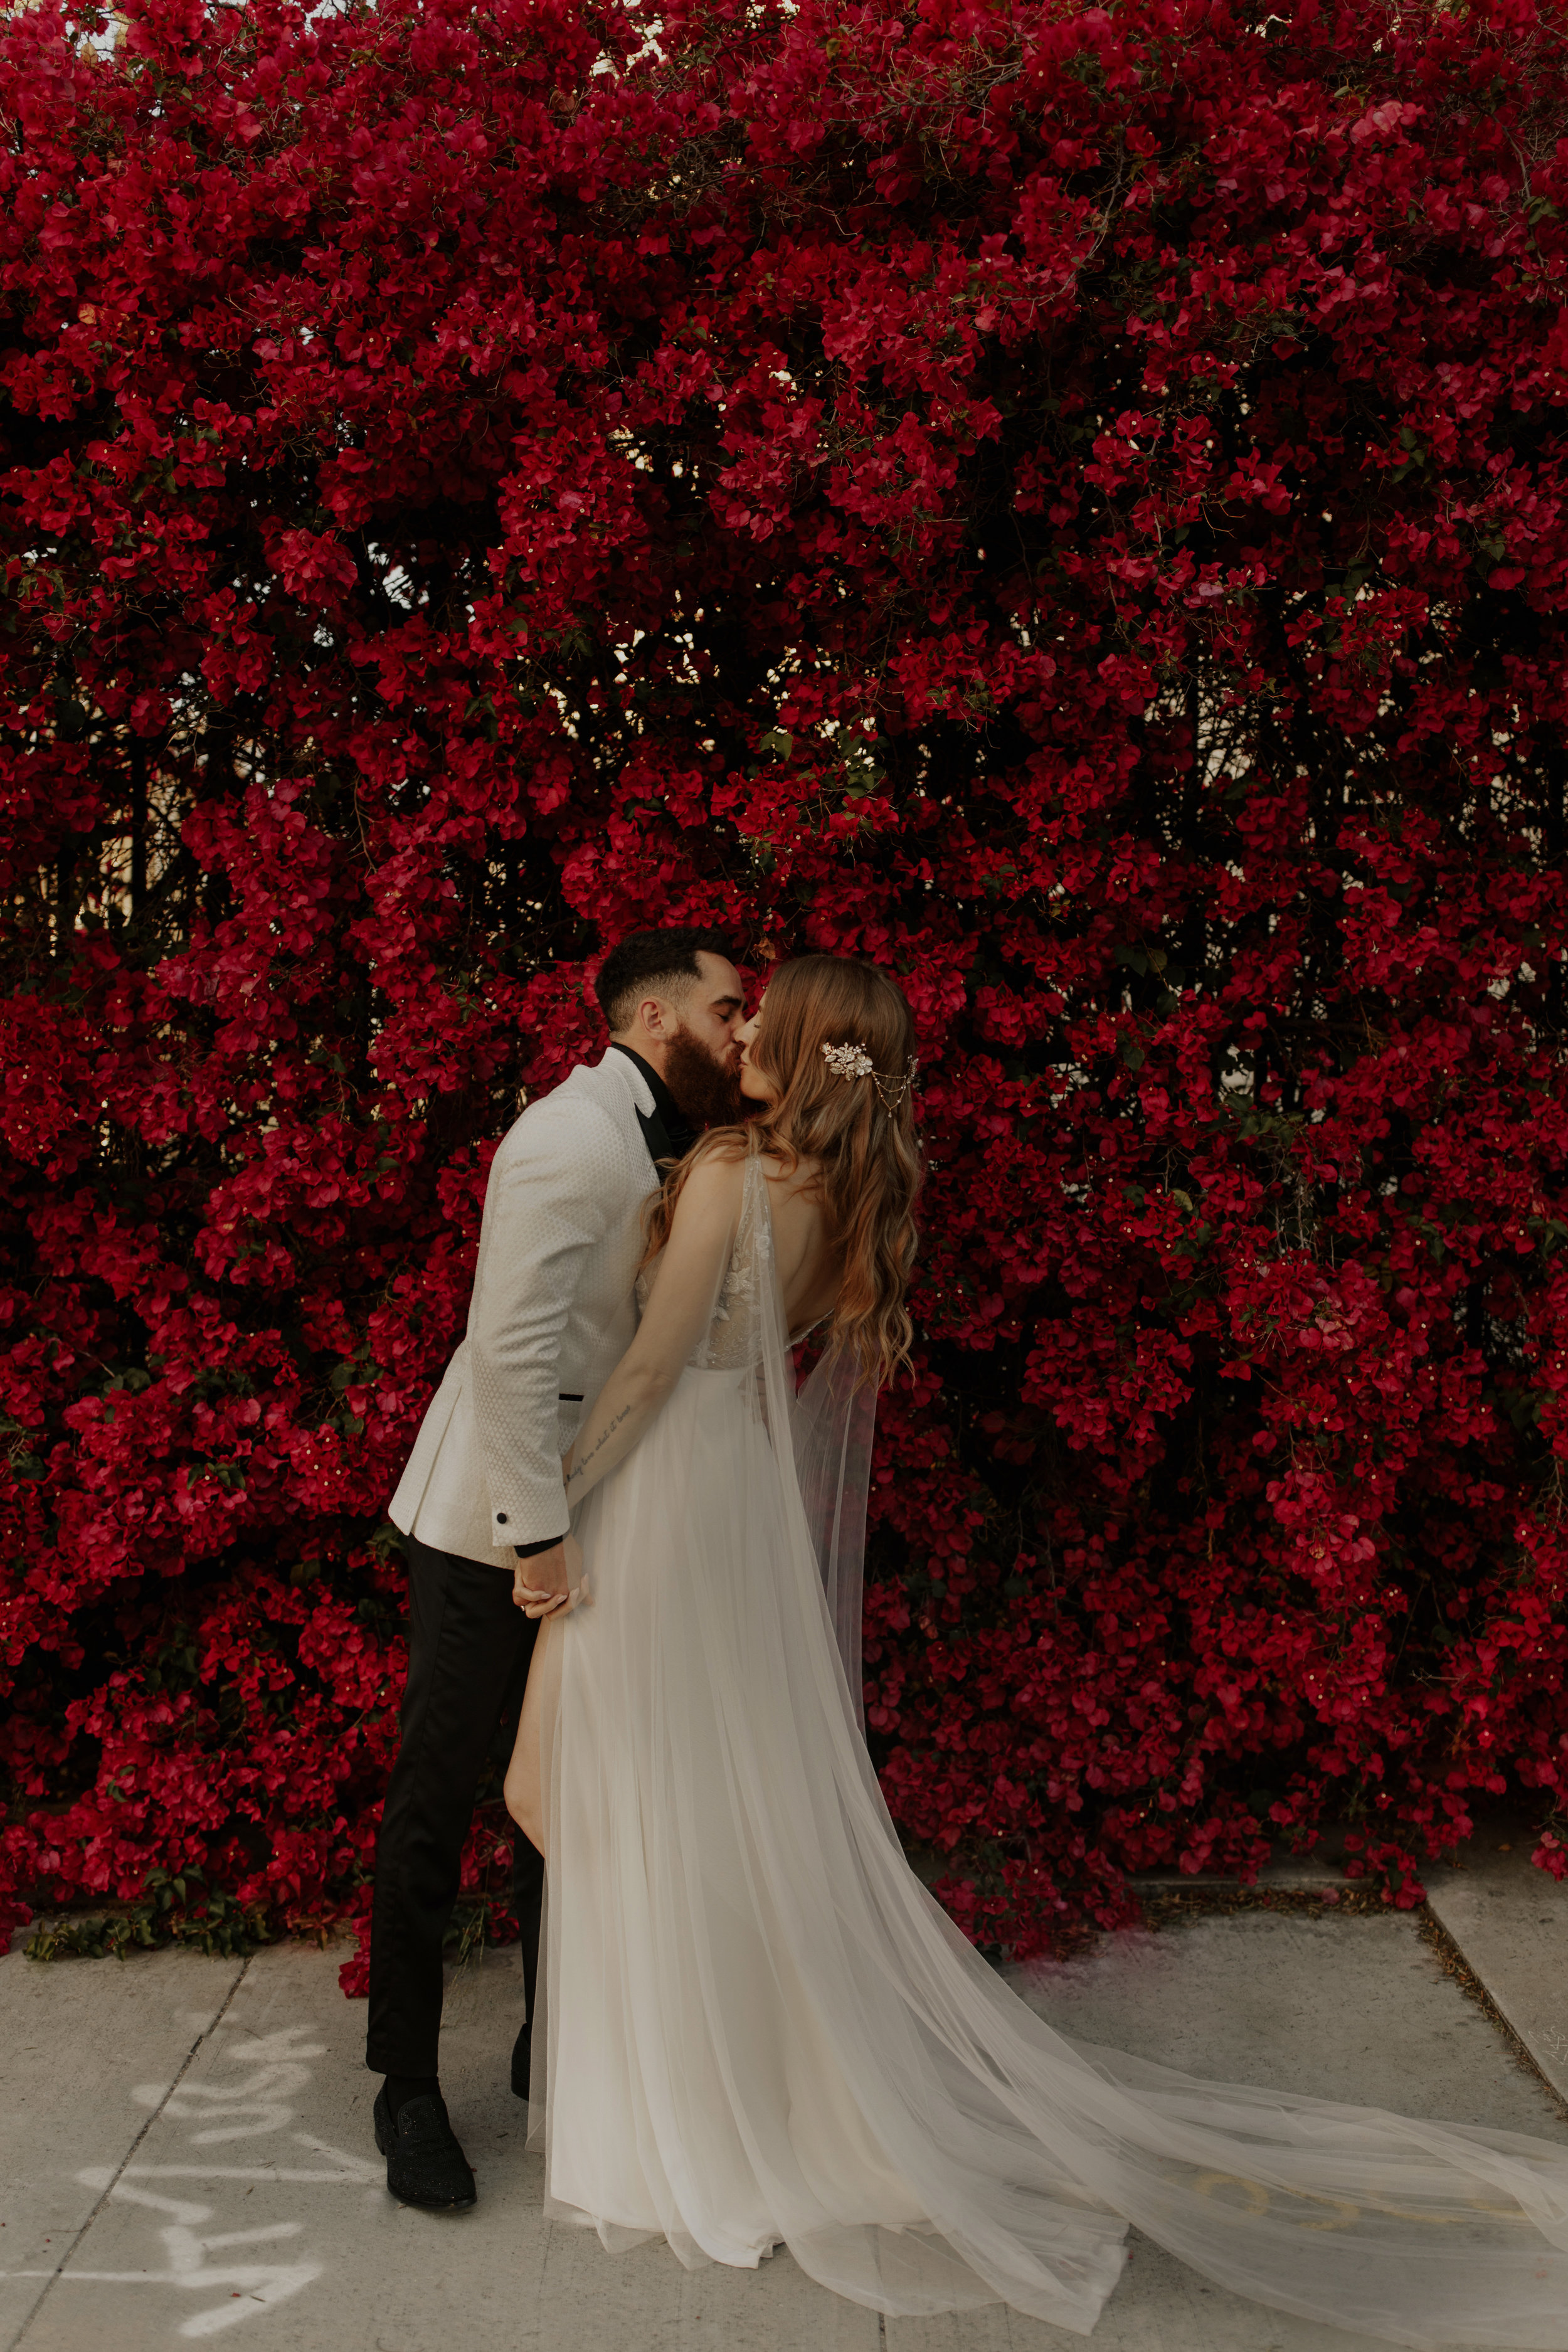 Downtown-LA-Wedding-MeganandRonny-443 copy.jpg